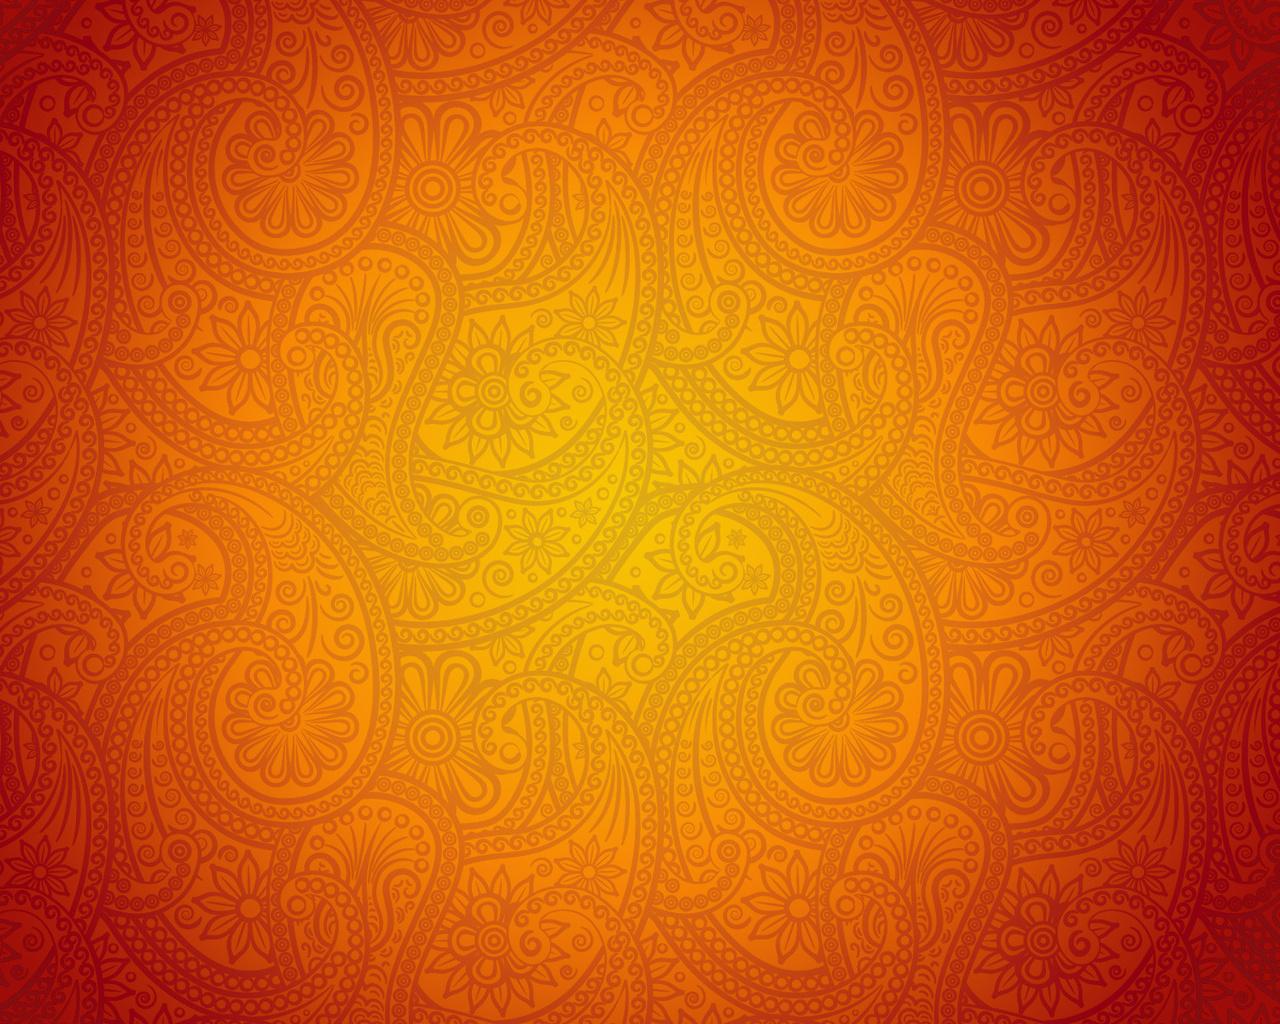 Wallpapers Fondo Naranja